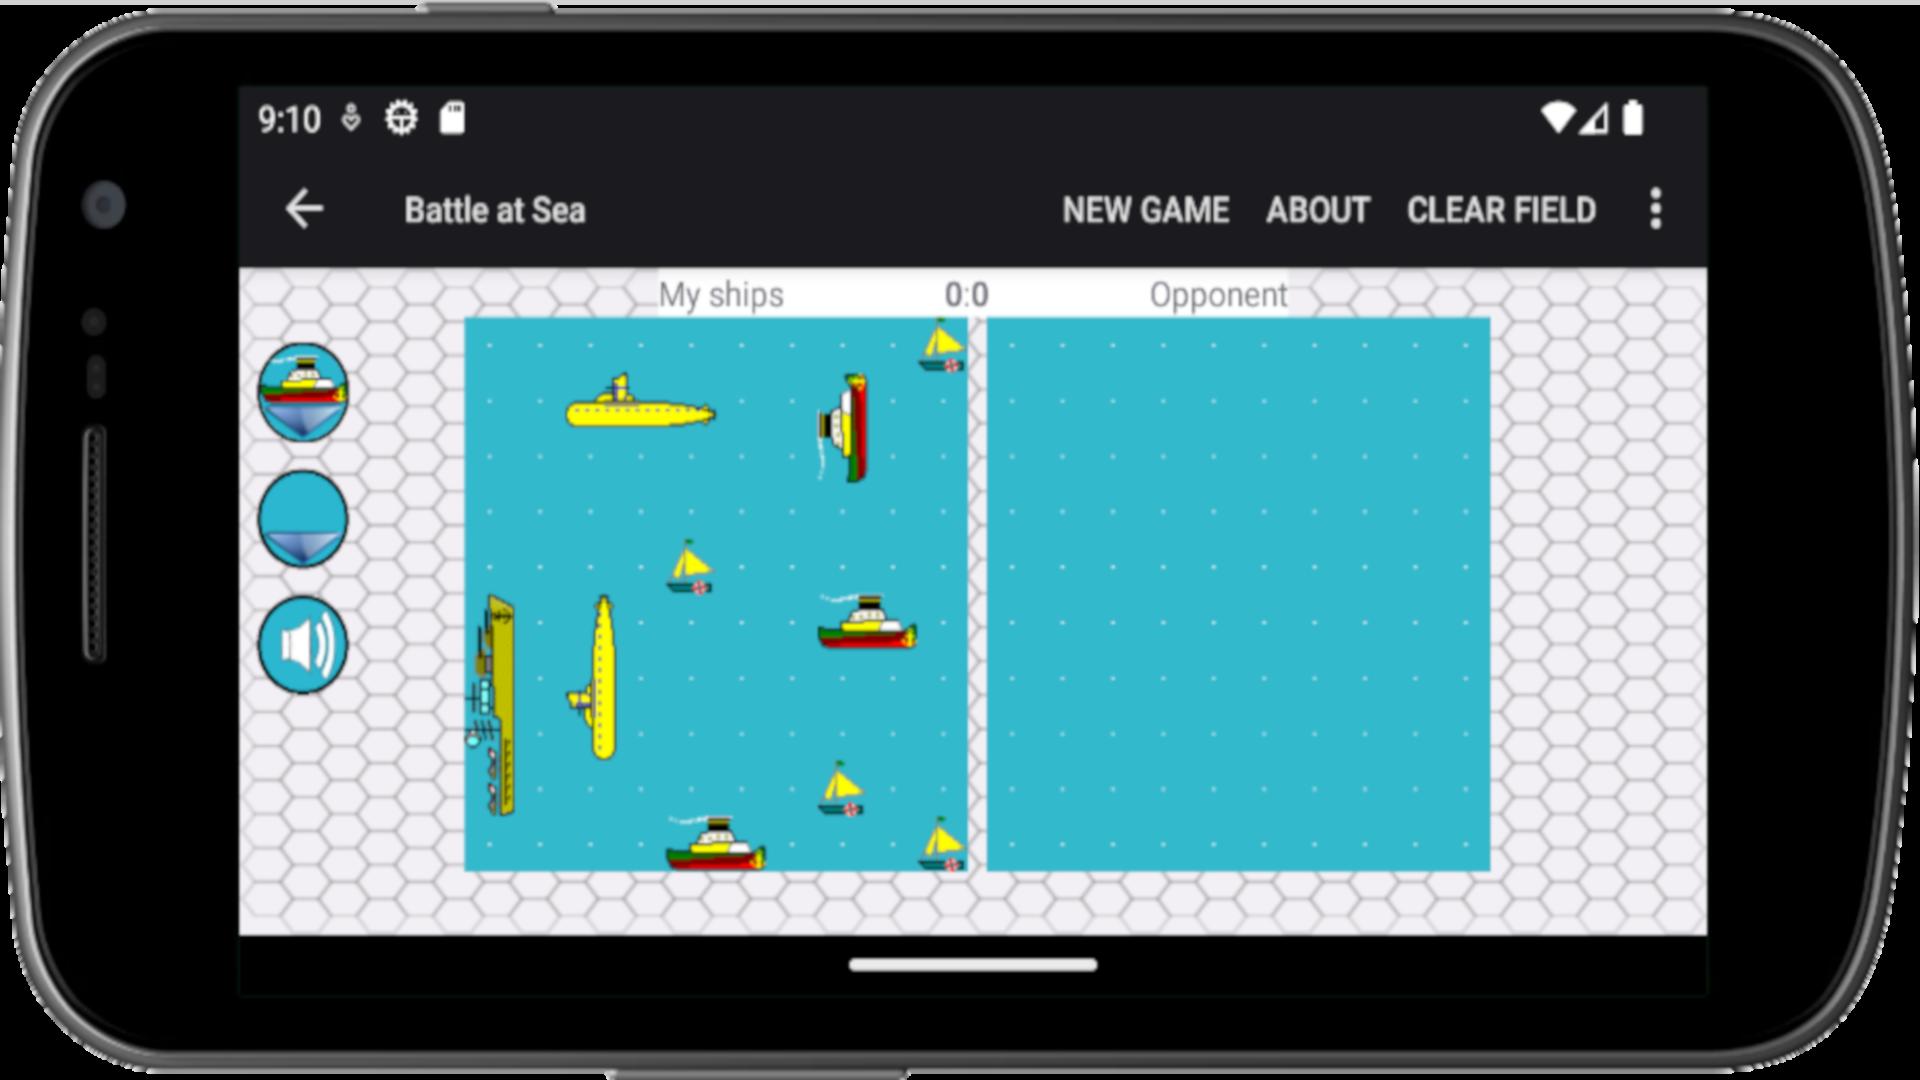 Battleship - Android game